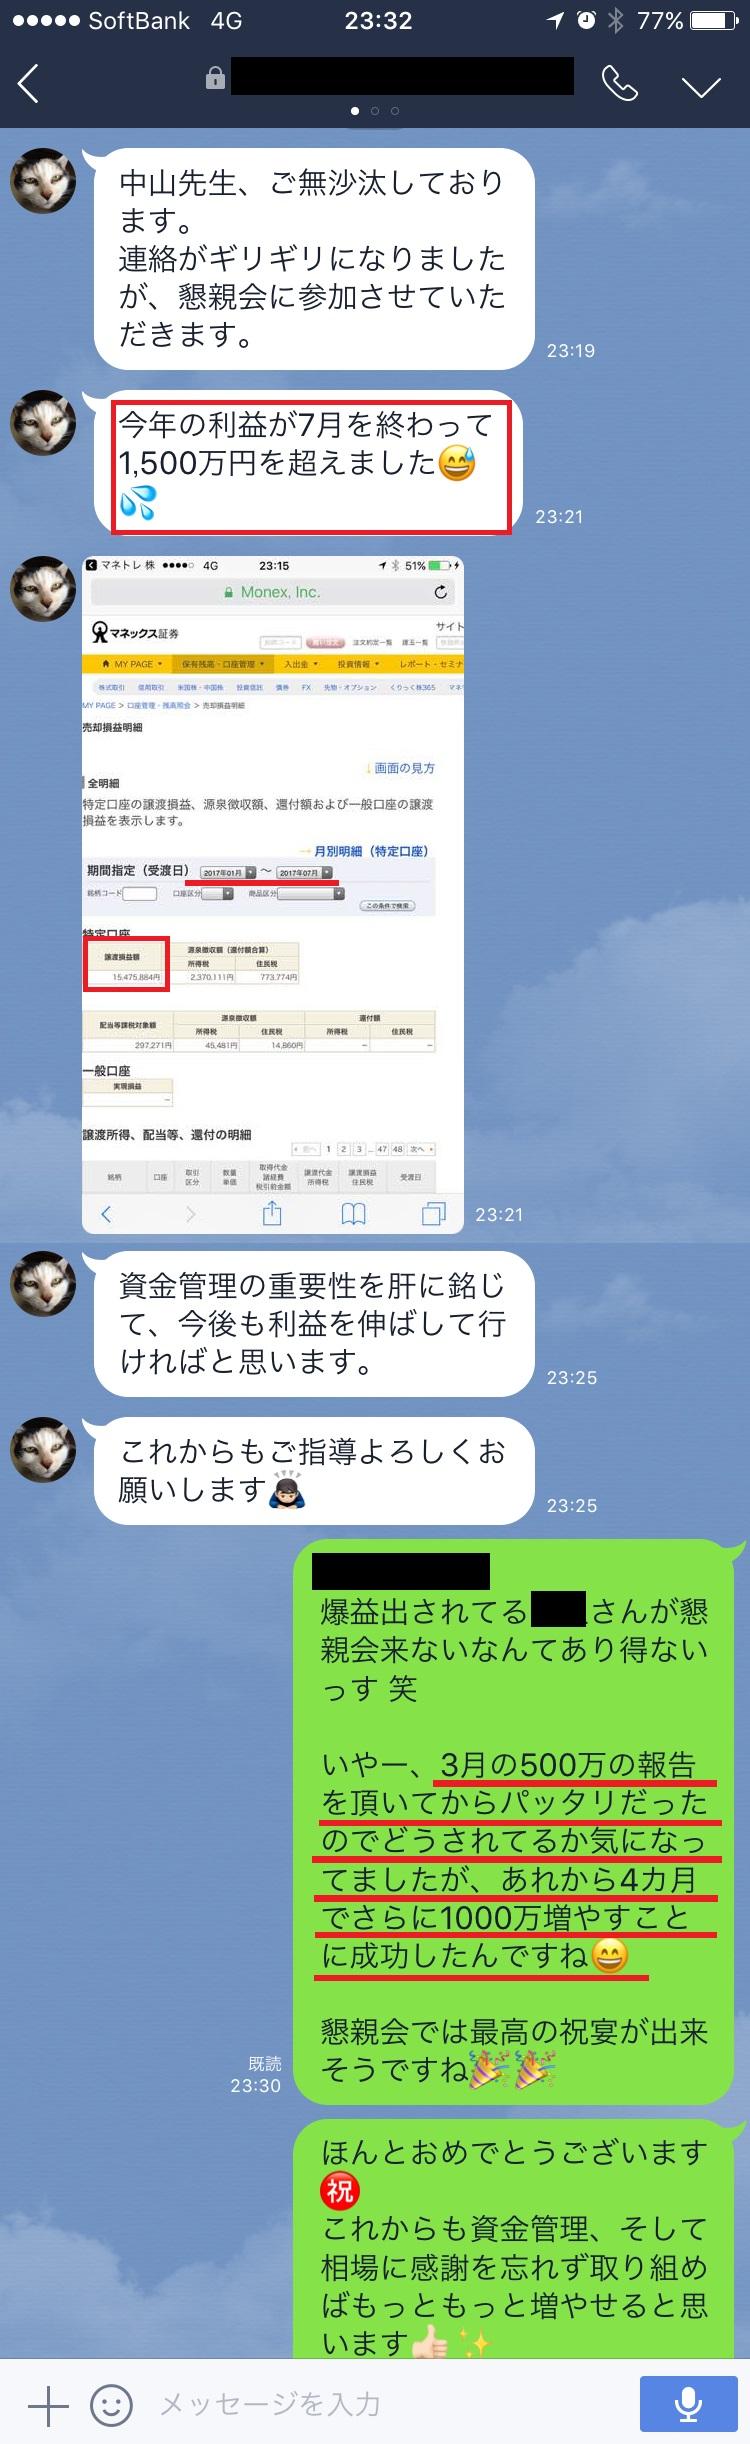 line137